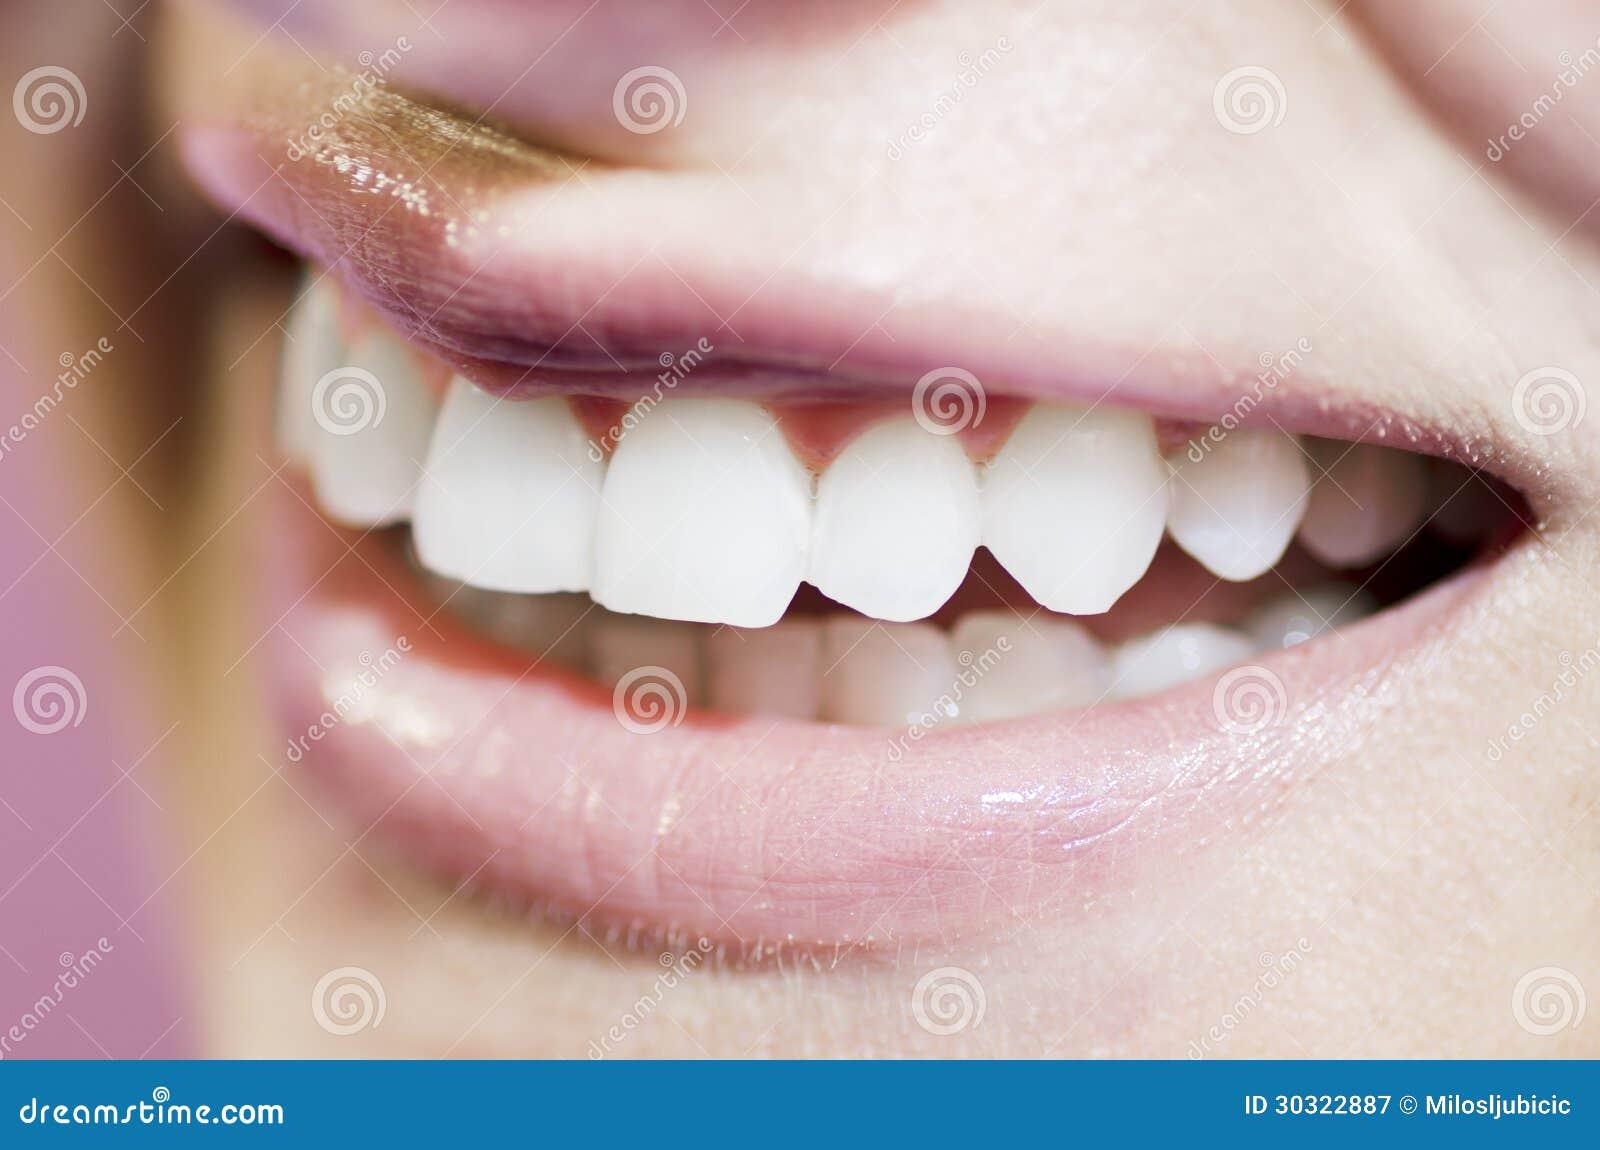 beautiful teeth smile royalty free stock photography